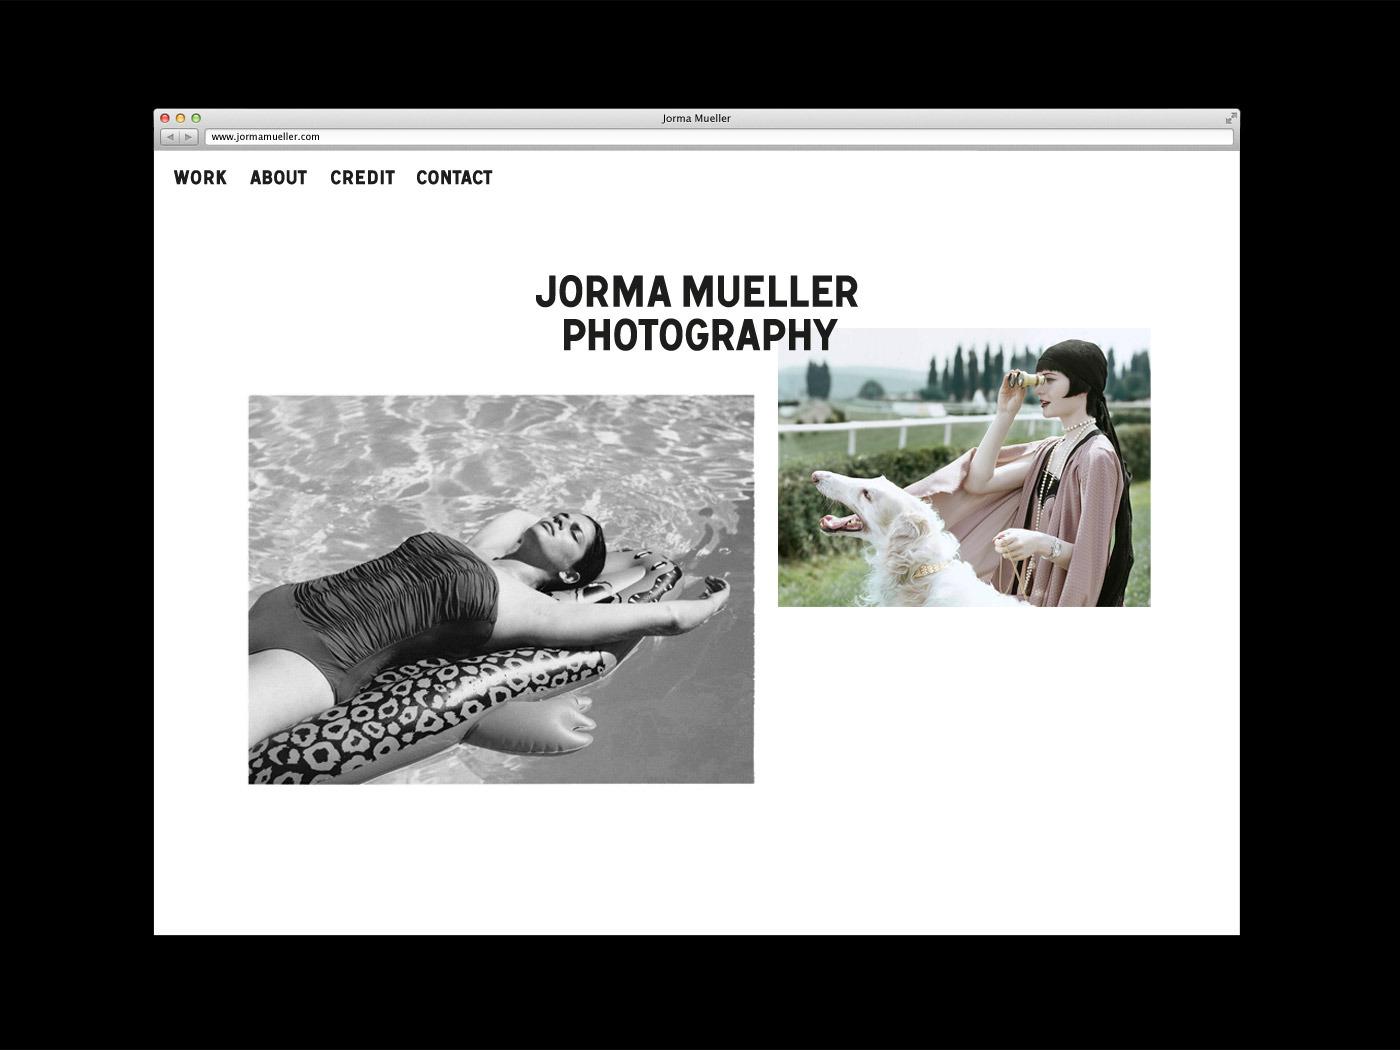 Bureau Collective – Jorma Mueller Photography